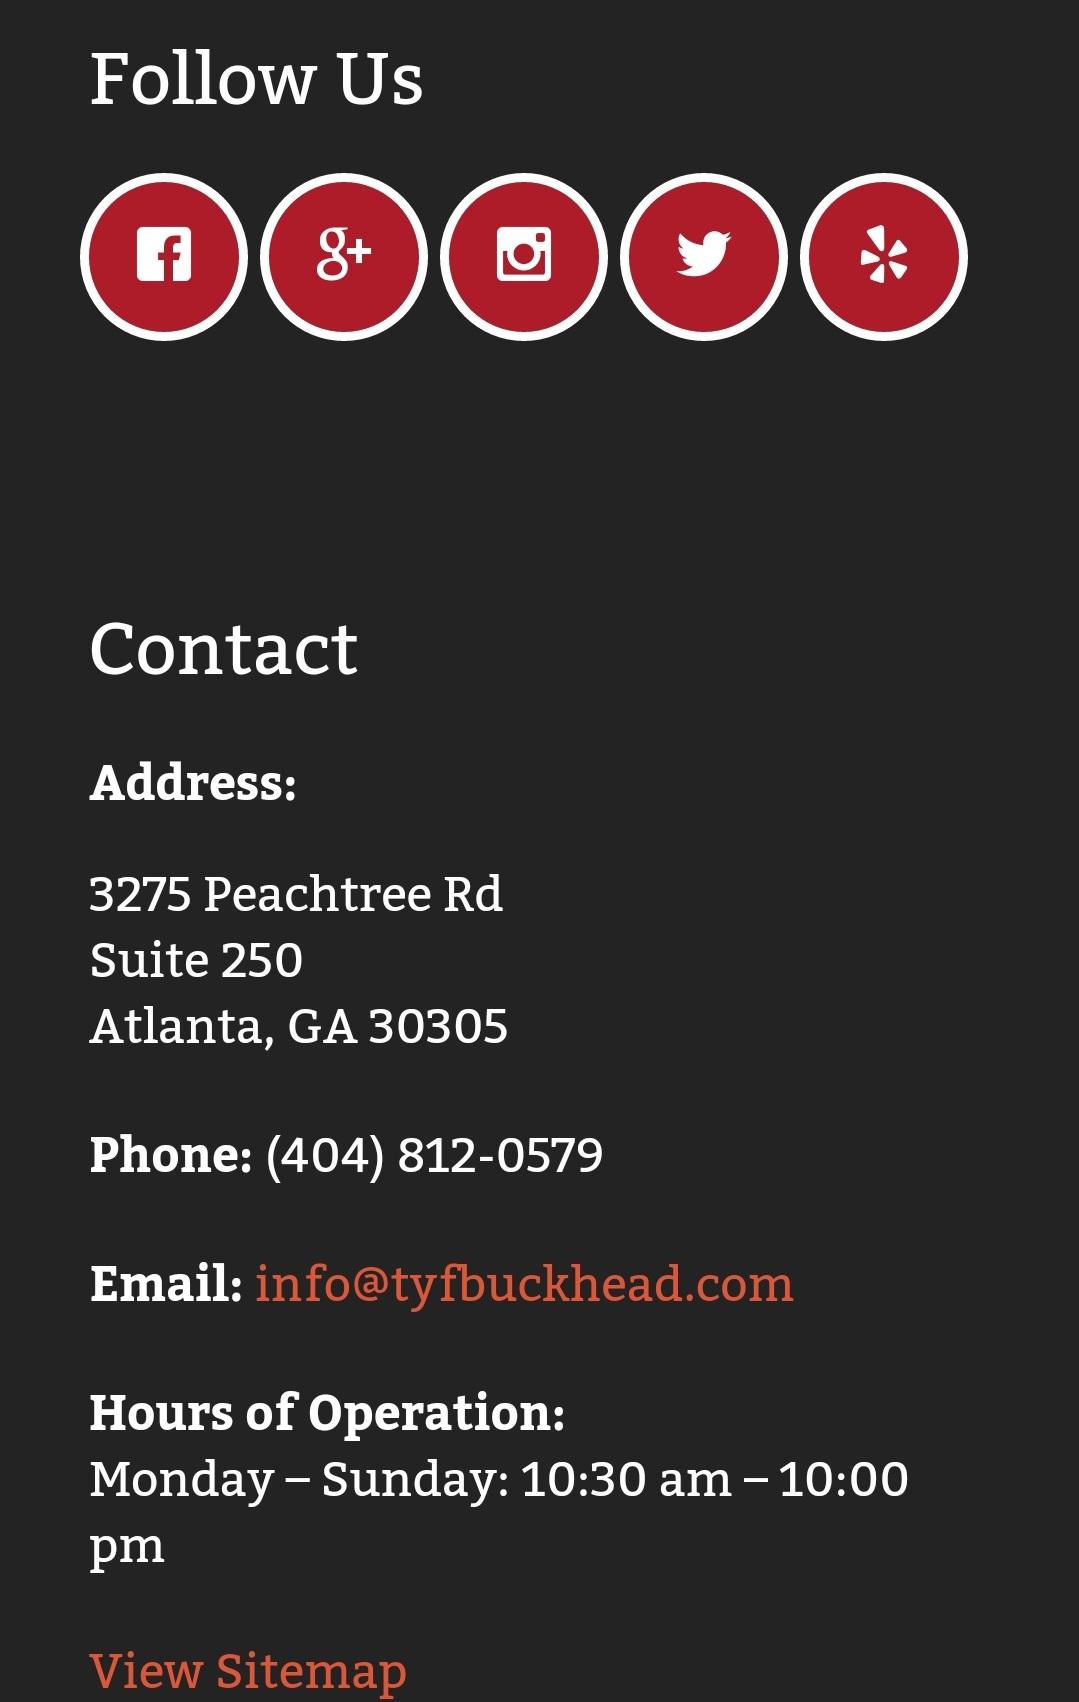 Treat Your Feet Buckhead Mobile Web Design 3